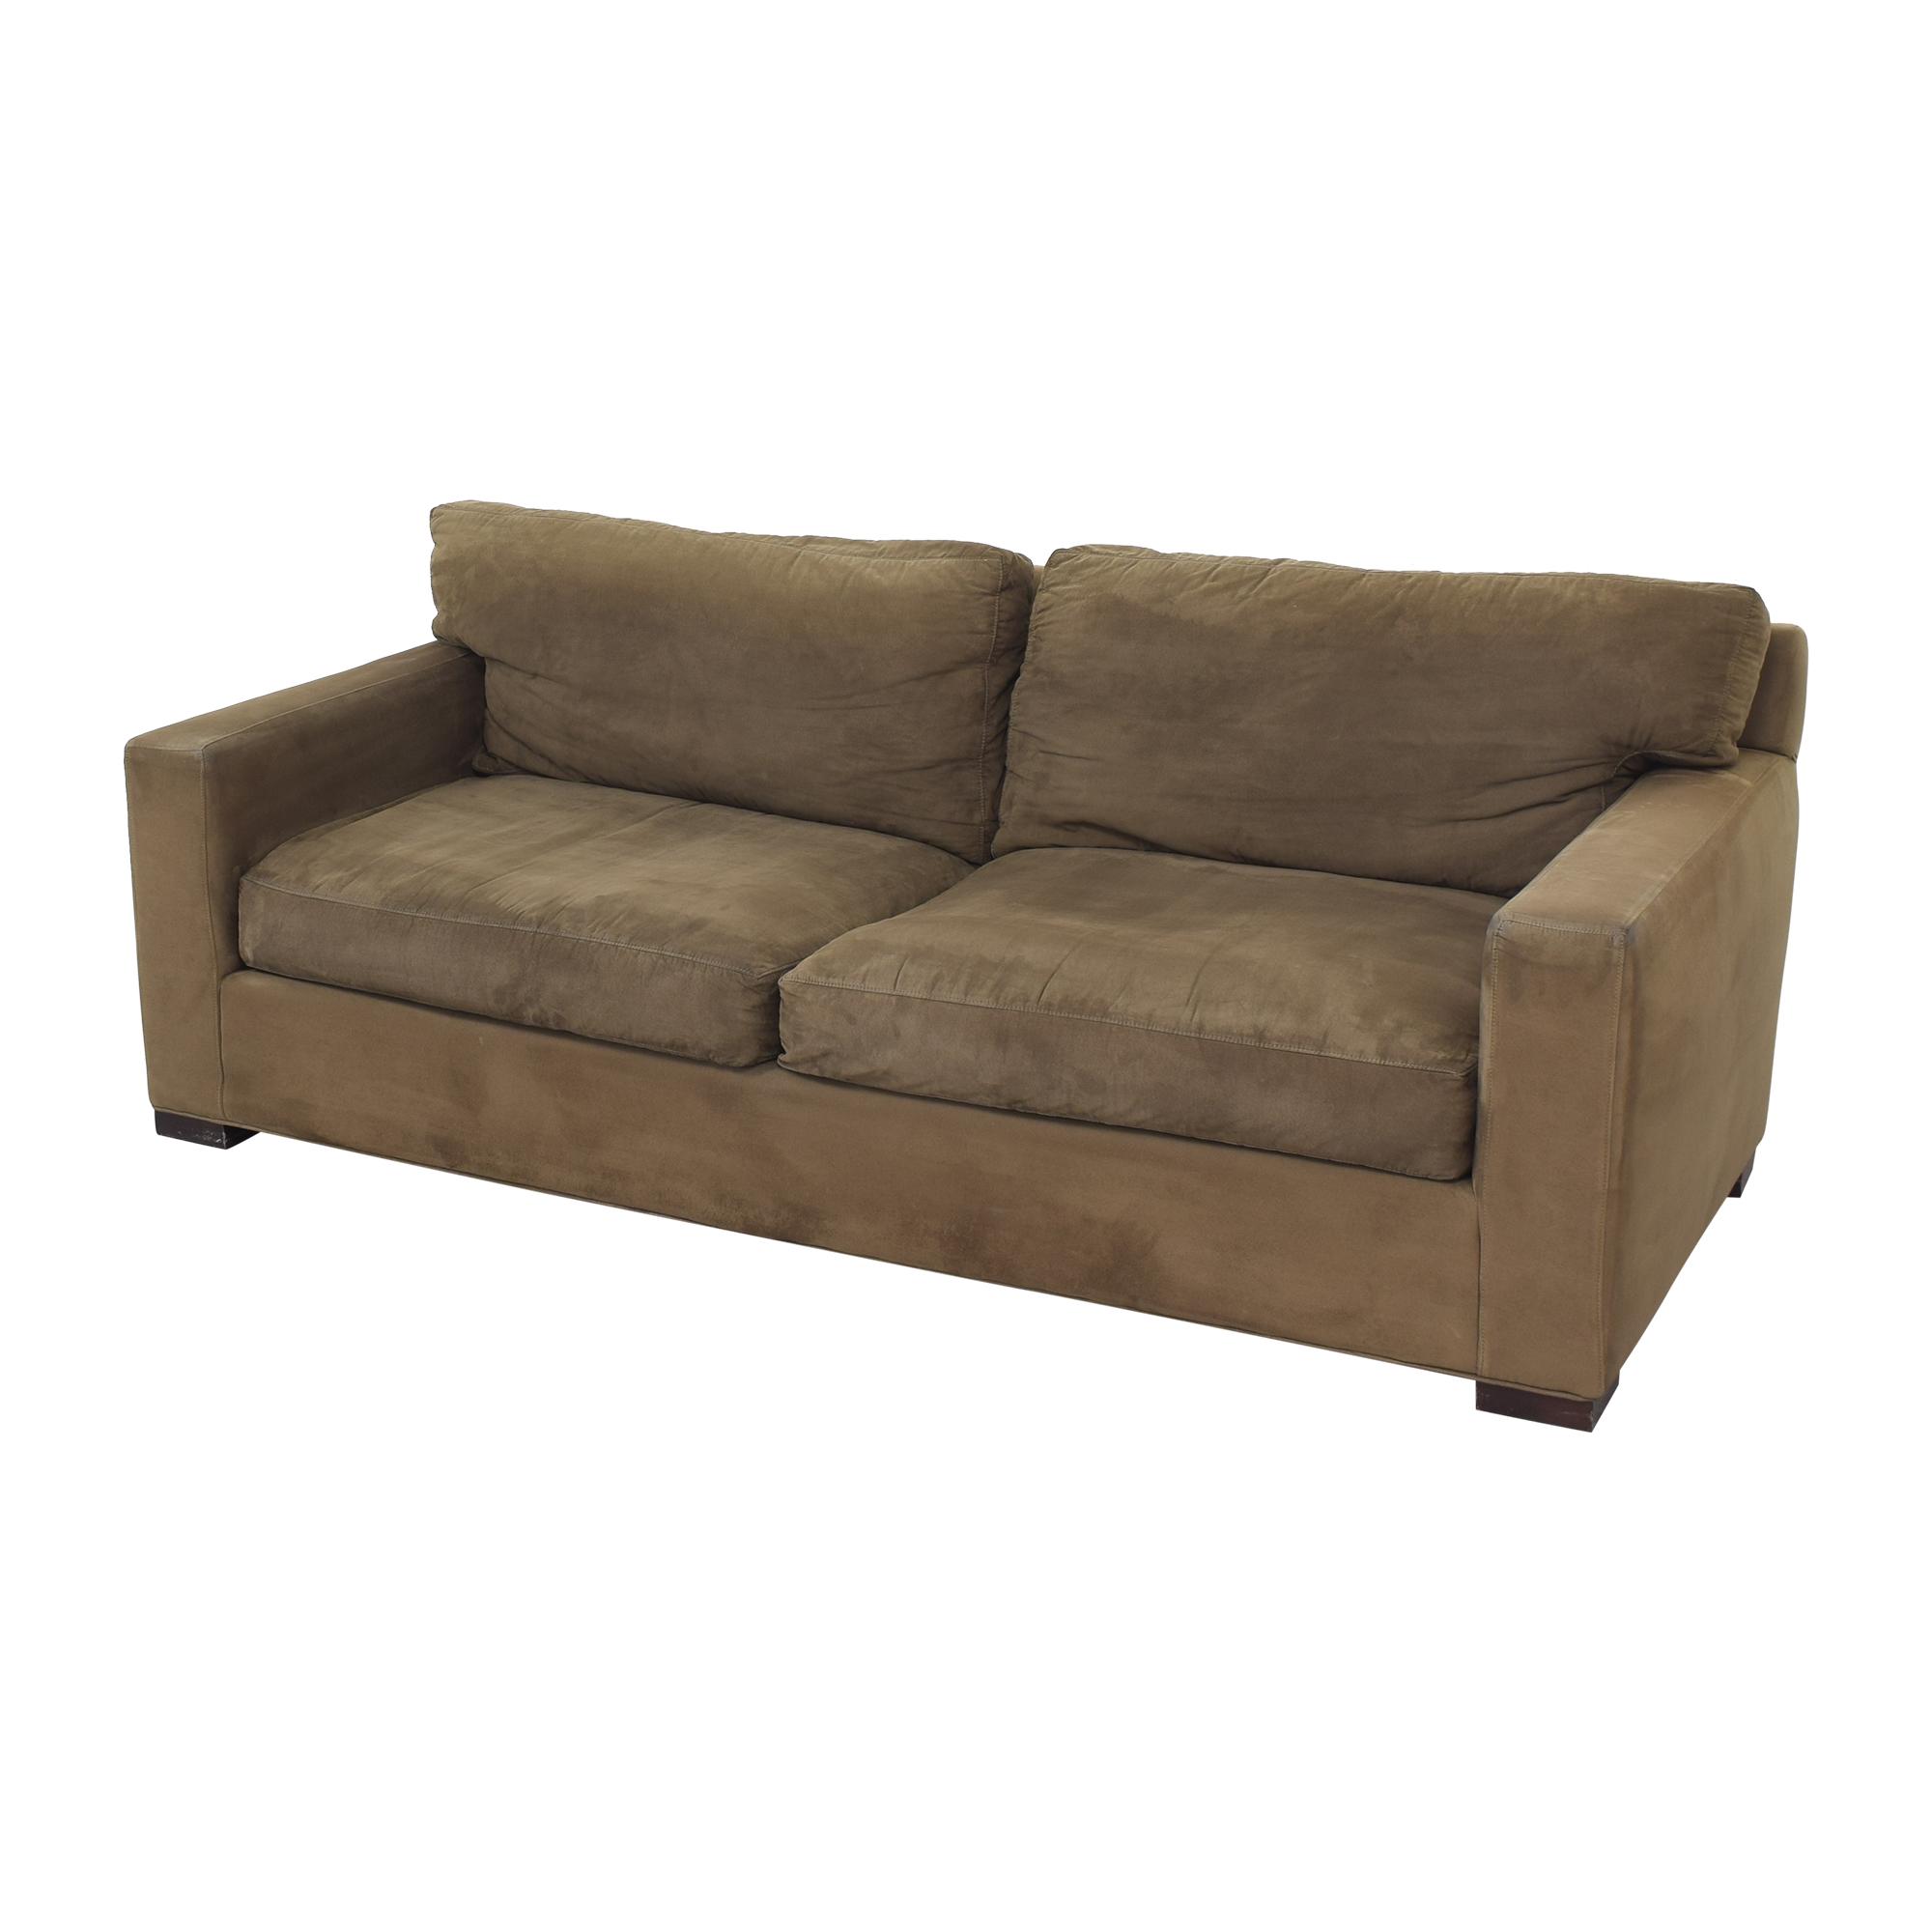 Crate & Barrel Crate & Barrel Axis II Two Cushion Sofa Sofas